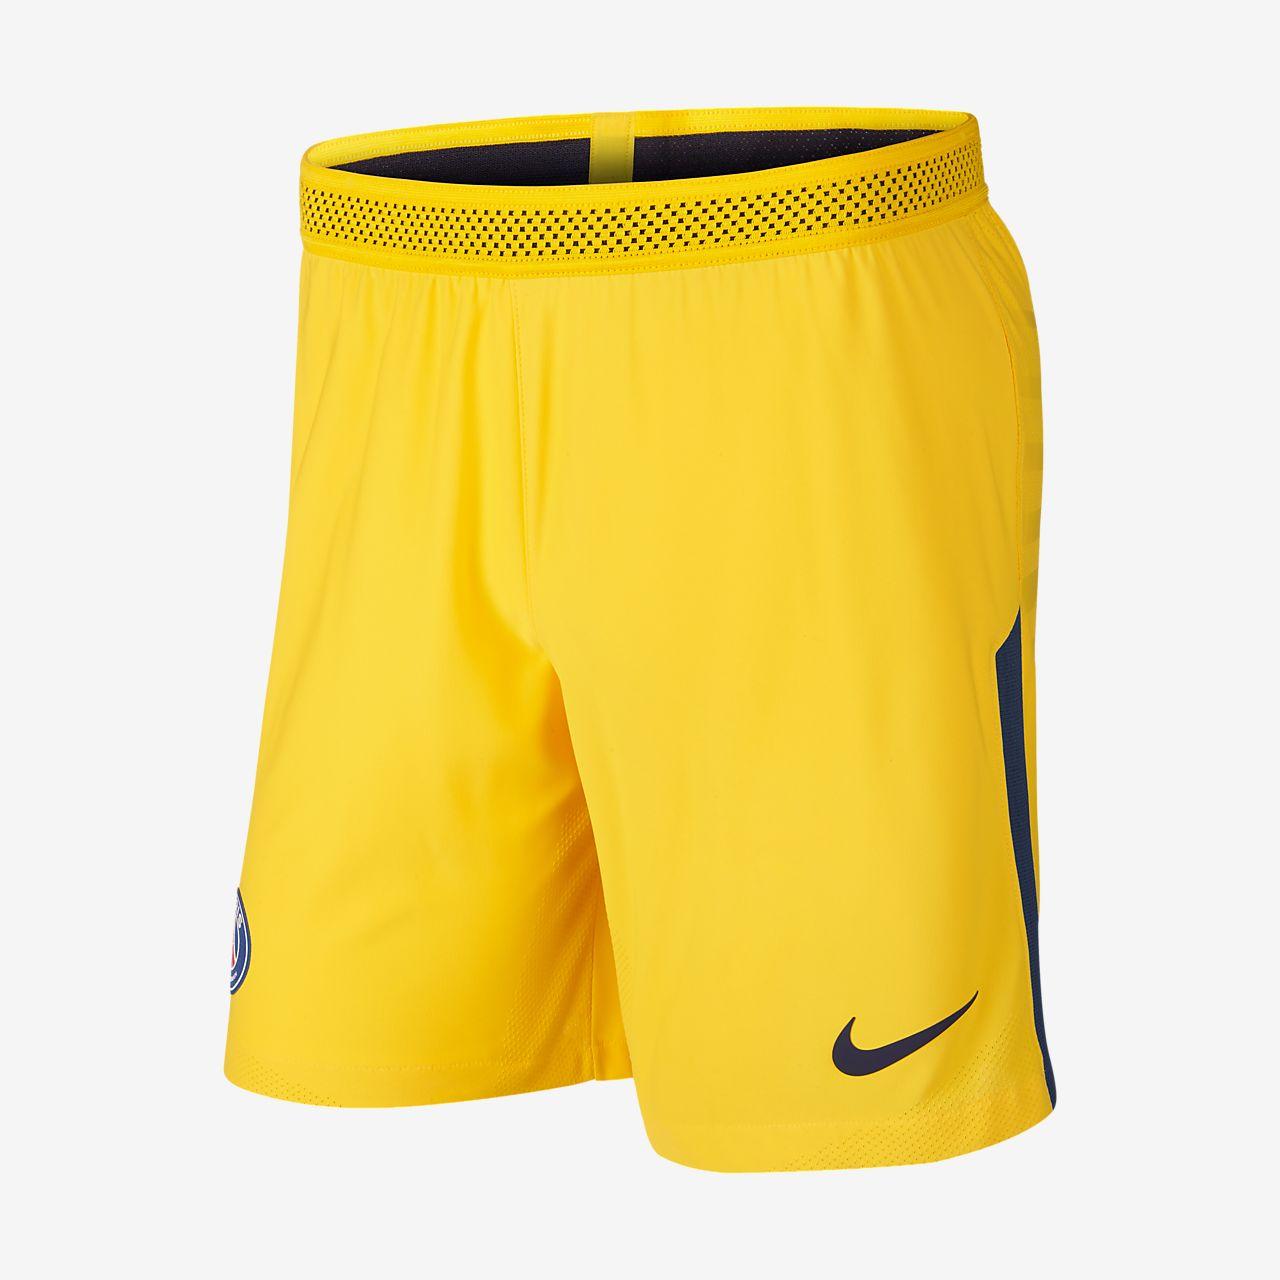 ... 2017/18 Paris Saint-Germain Vapor Match Men's Football Shorts